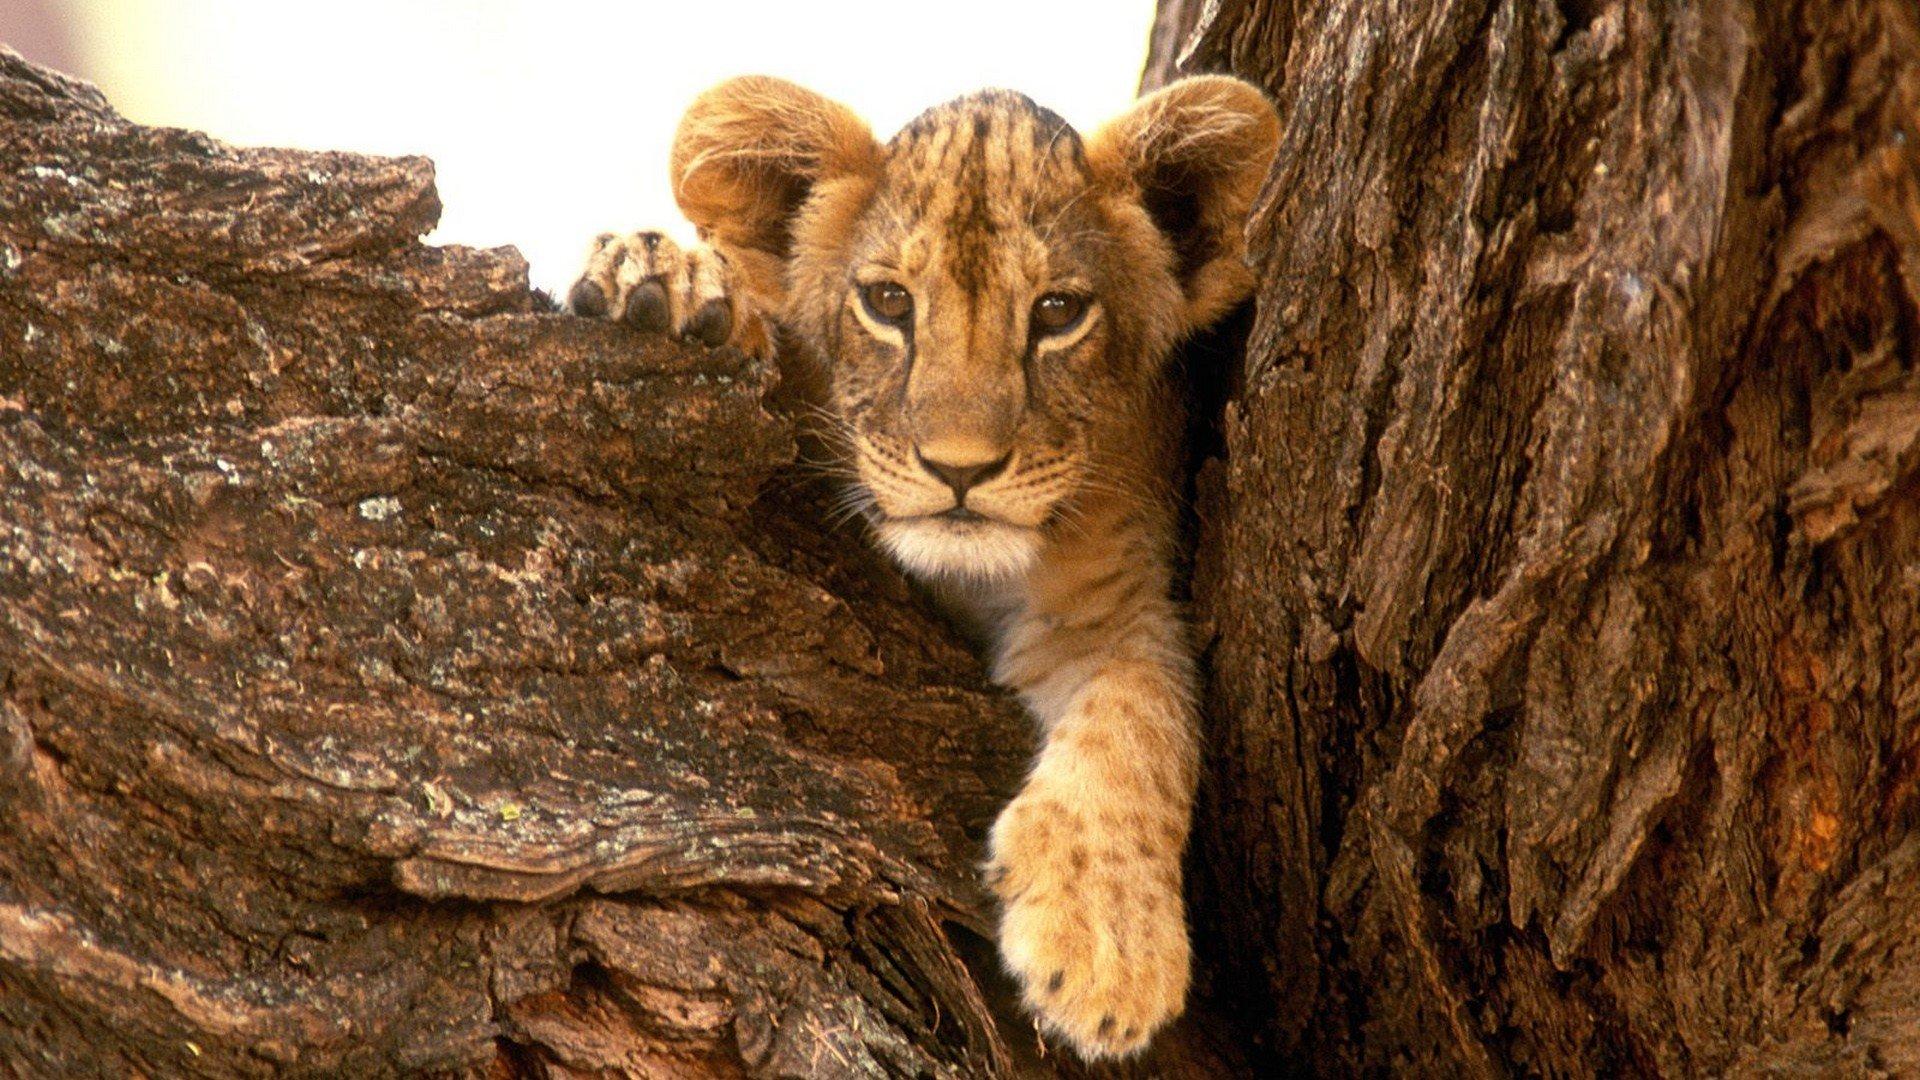 Nature Animals Wildlife Lions Furry Baby Wallpaper